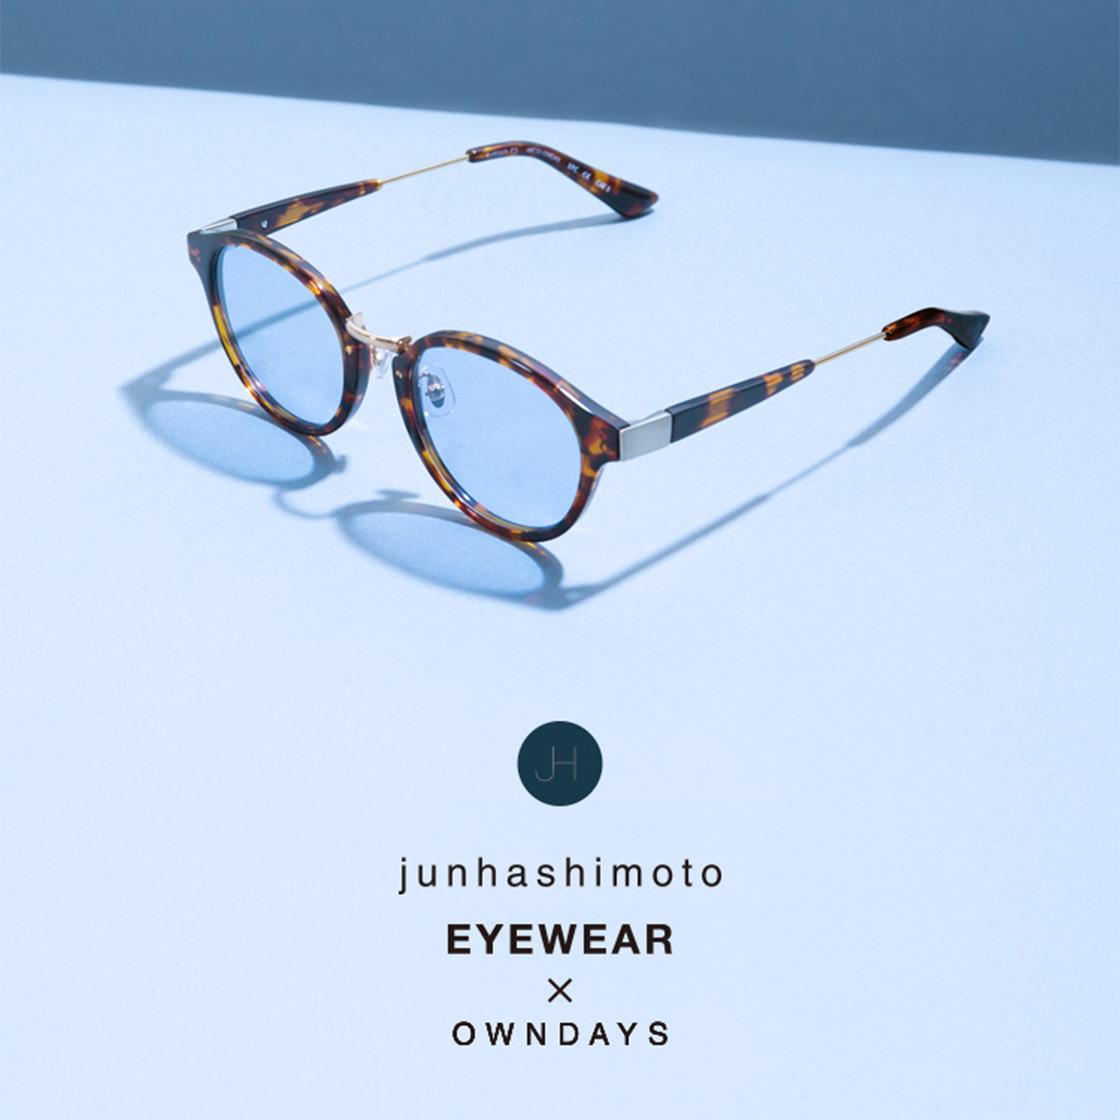 junhashimoto EYEWEAR x OWNDAYS